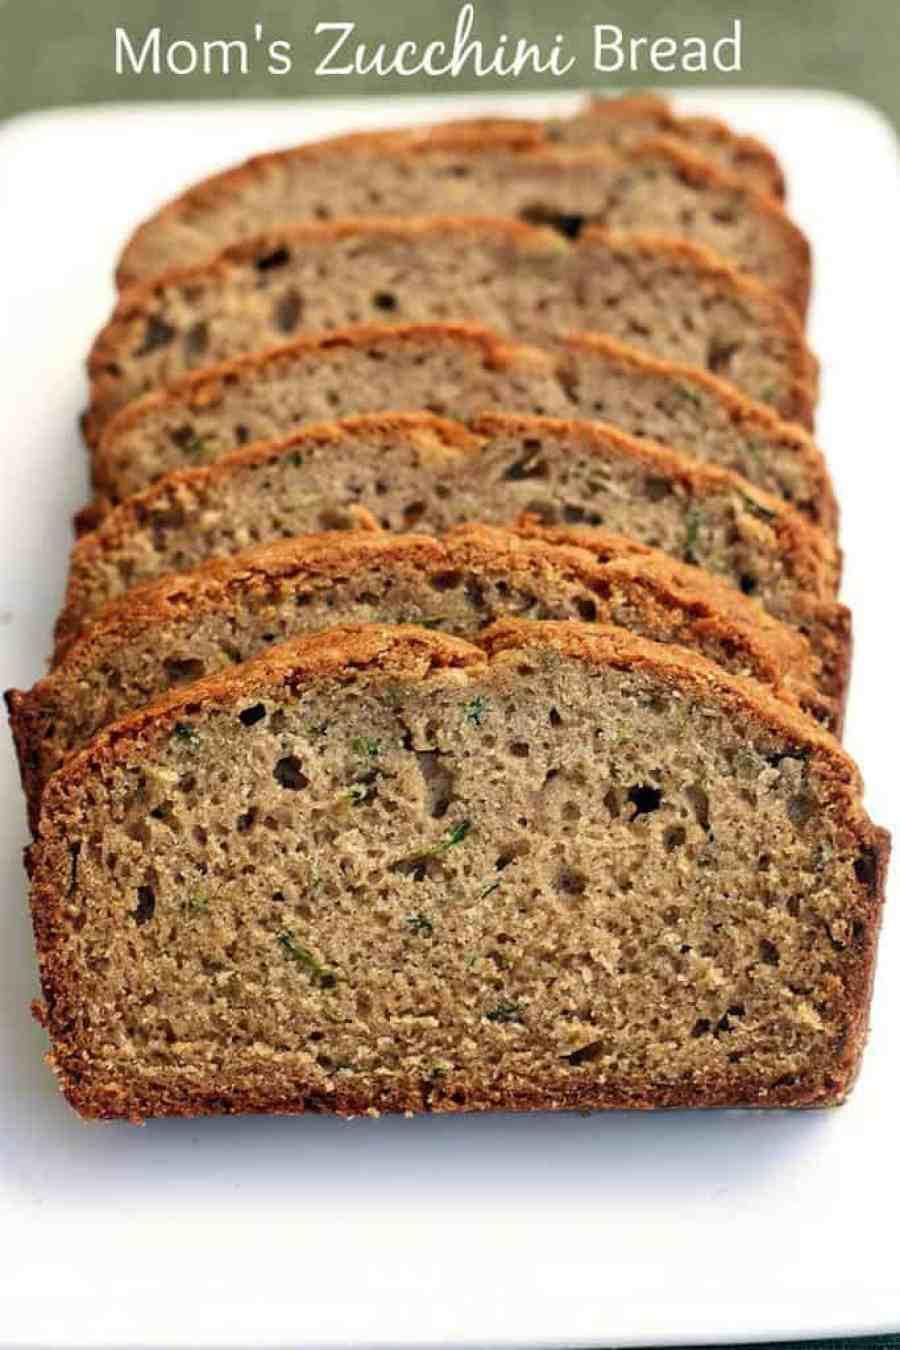 My favorite zucchini bread recipe!